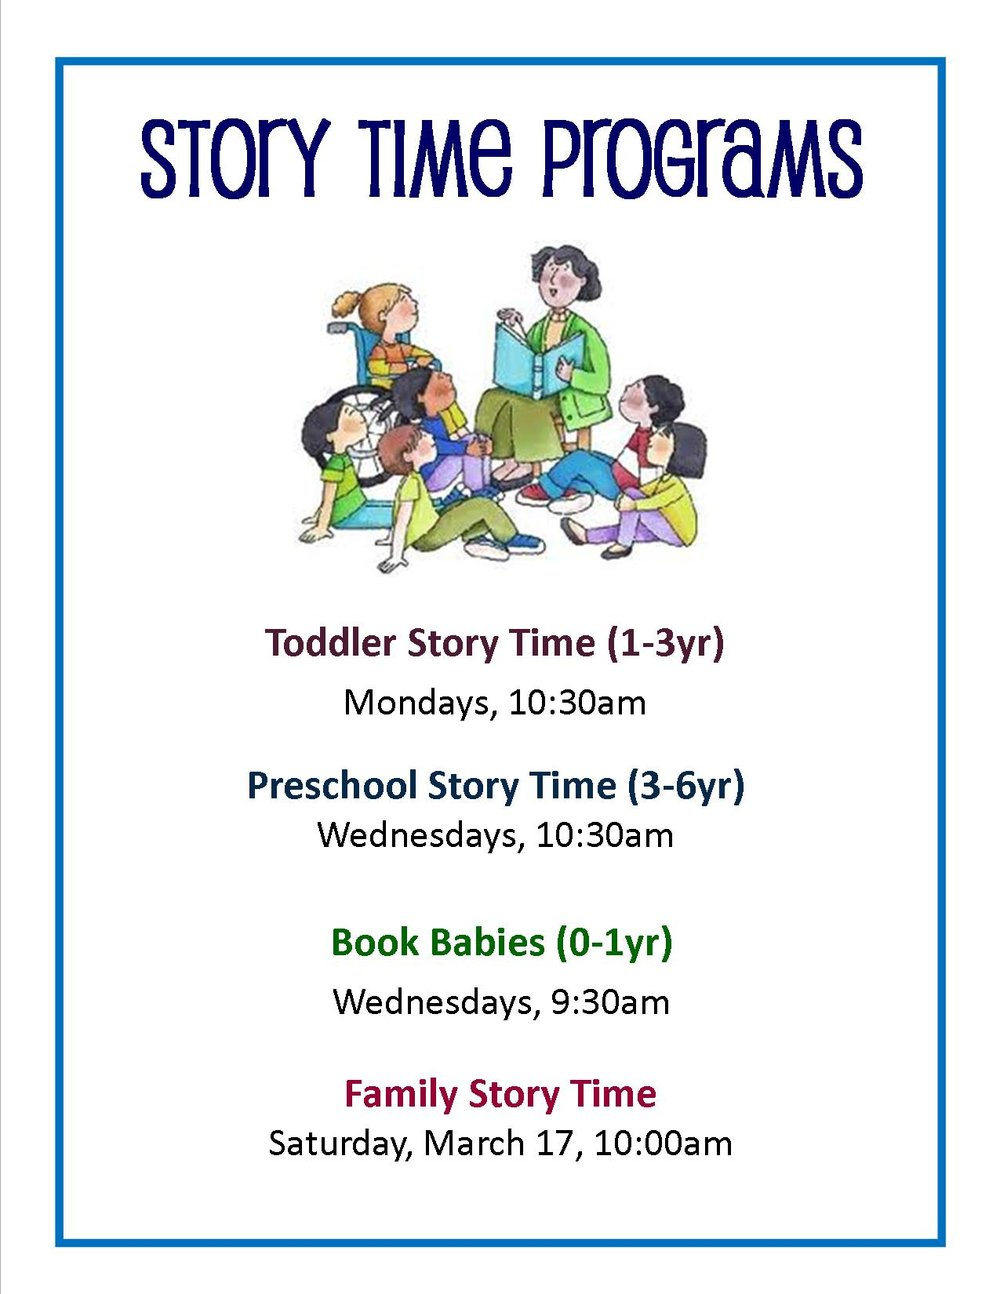 storytime programs.jpg